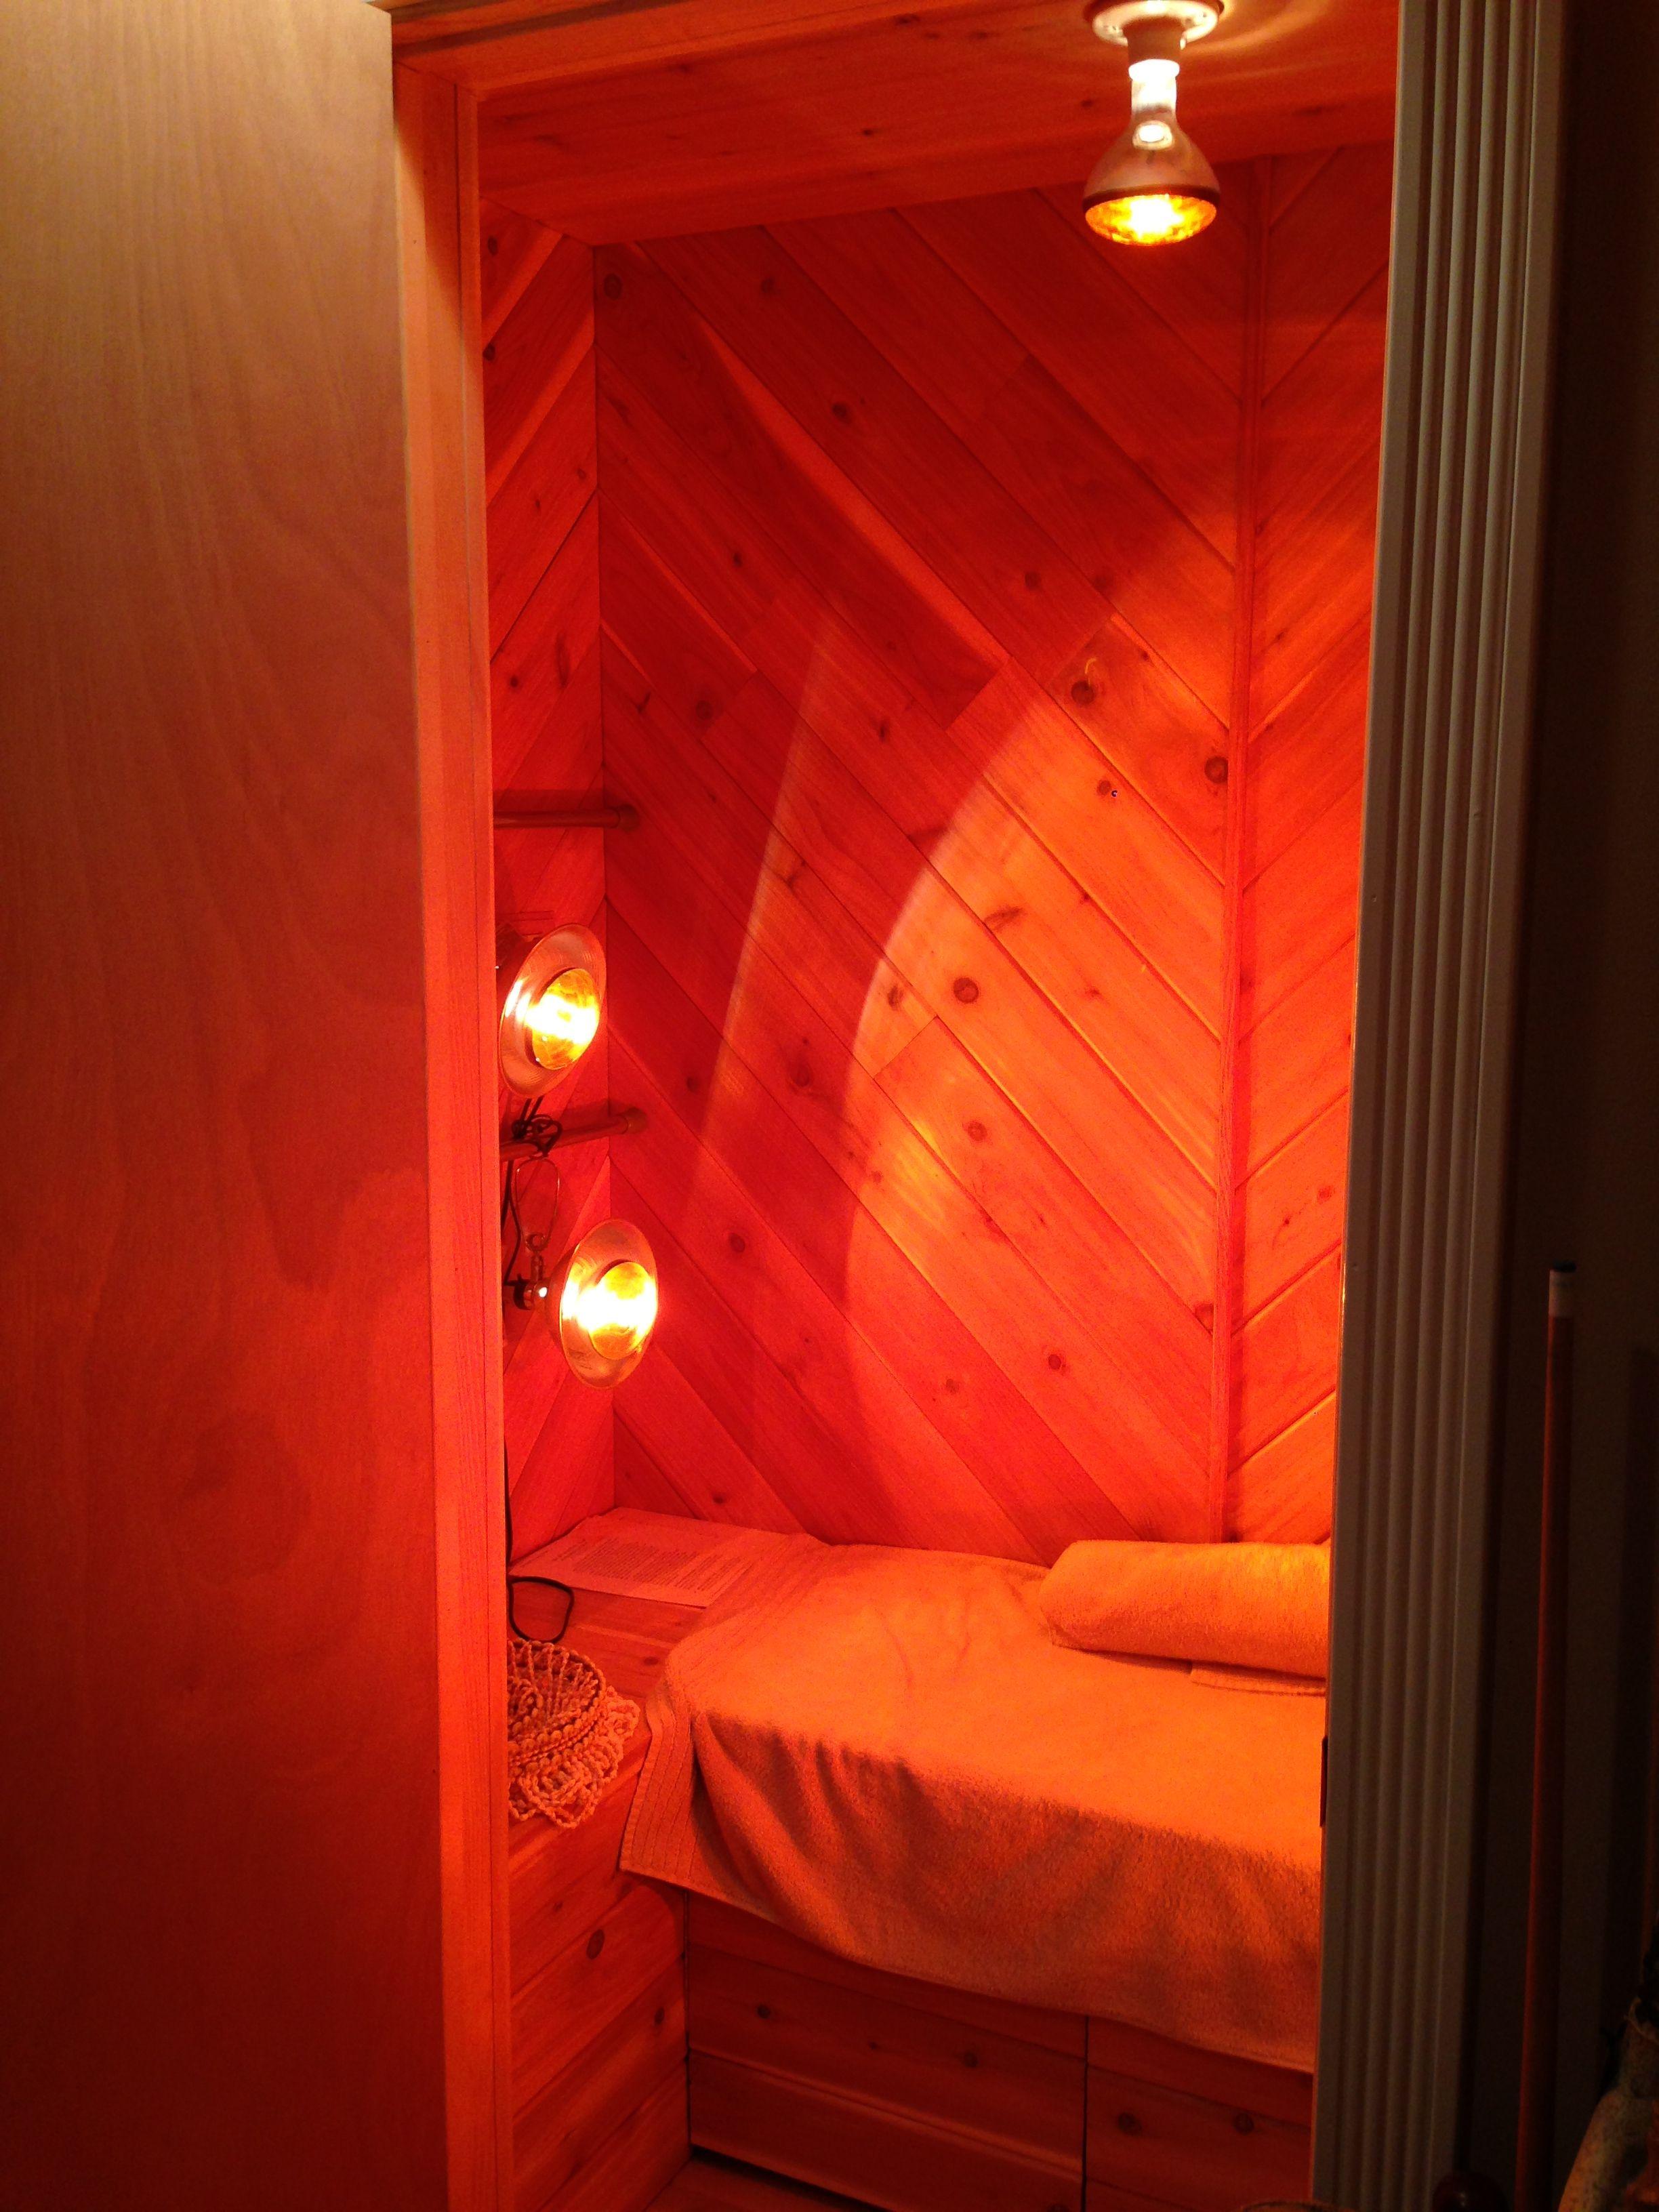 Captivating Basement Closet Turned To Near Infrared Sauna Room; Meditation, Healing.